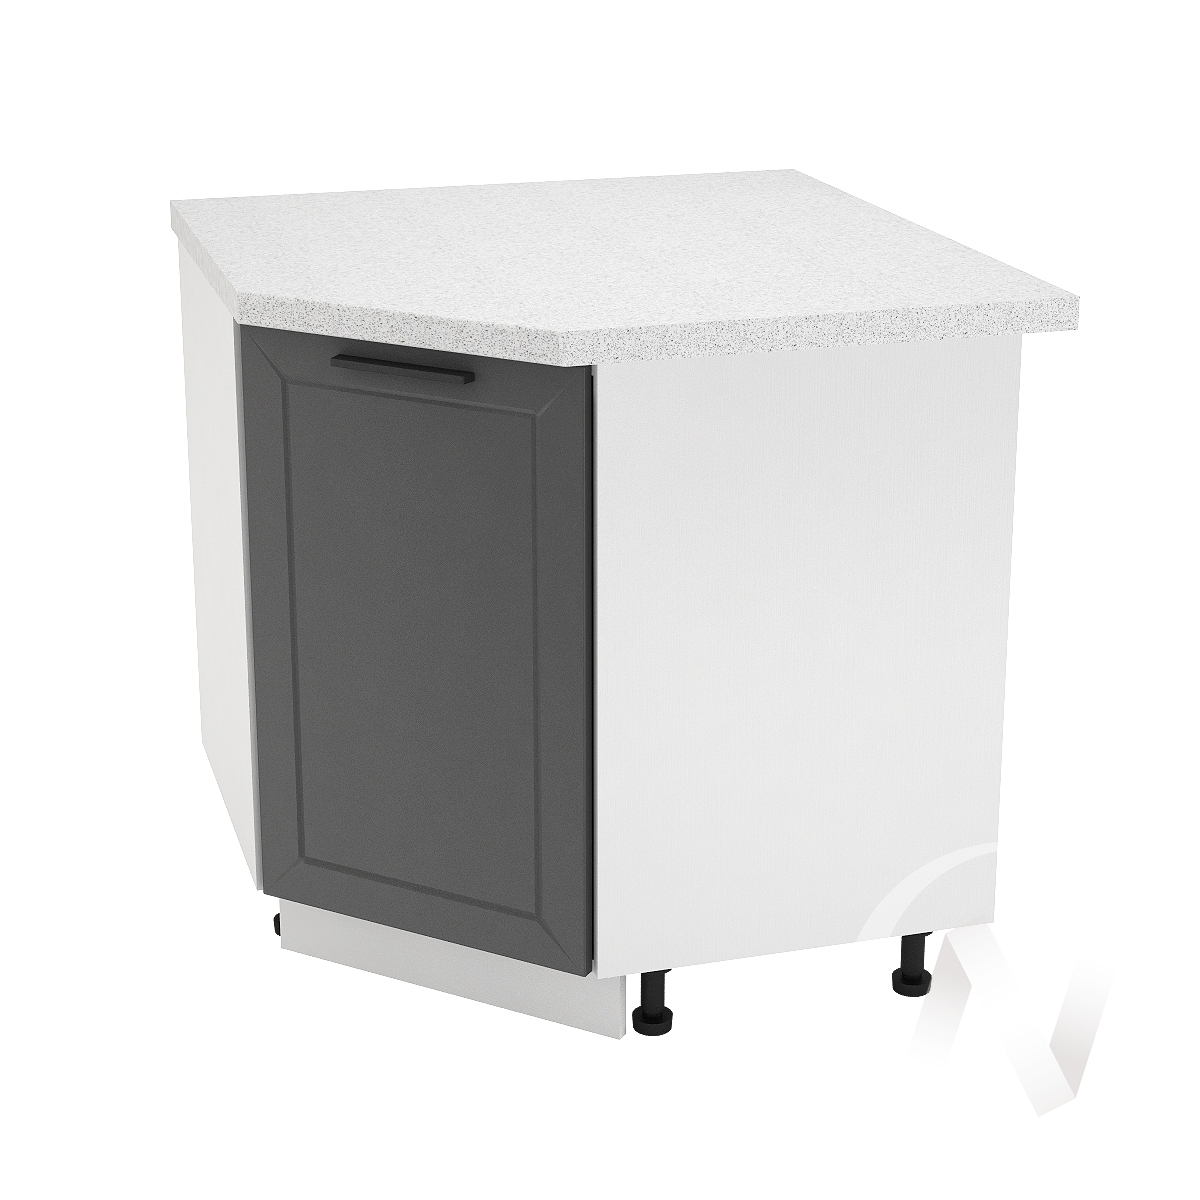 "Кухня ""Глетчер"": Шкаф нижний угловой 890, ШНУ 890 (Маренго силк/корпус белый)"